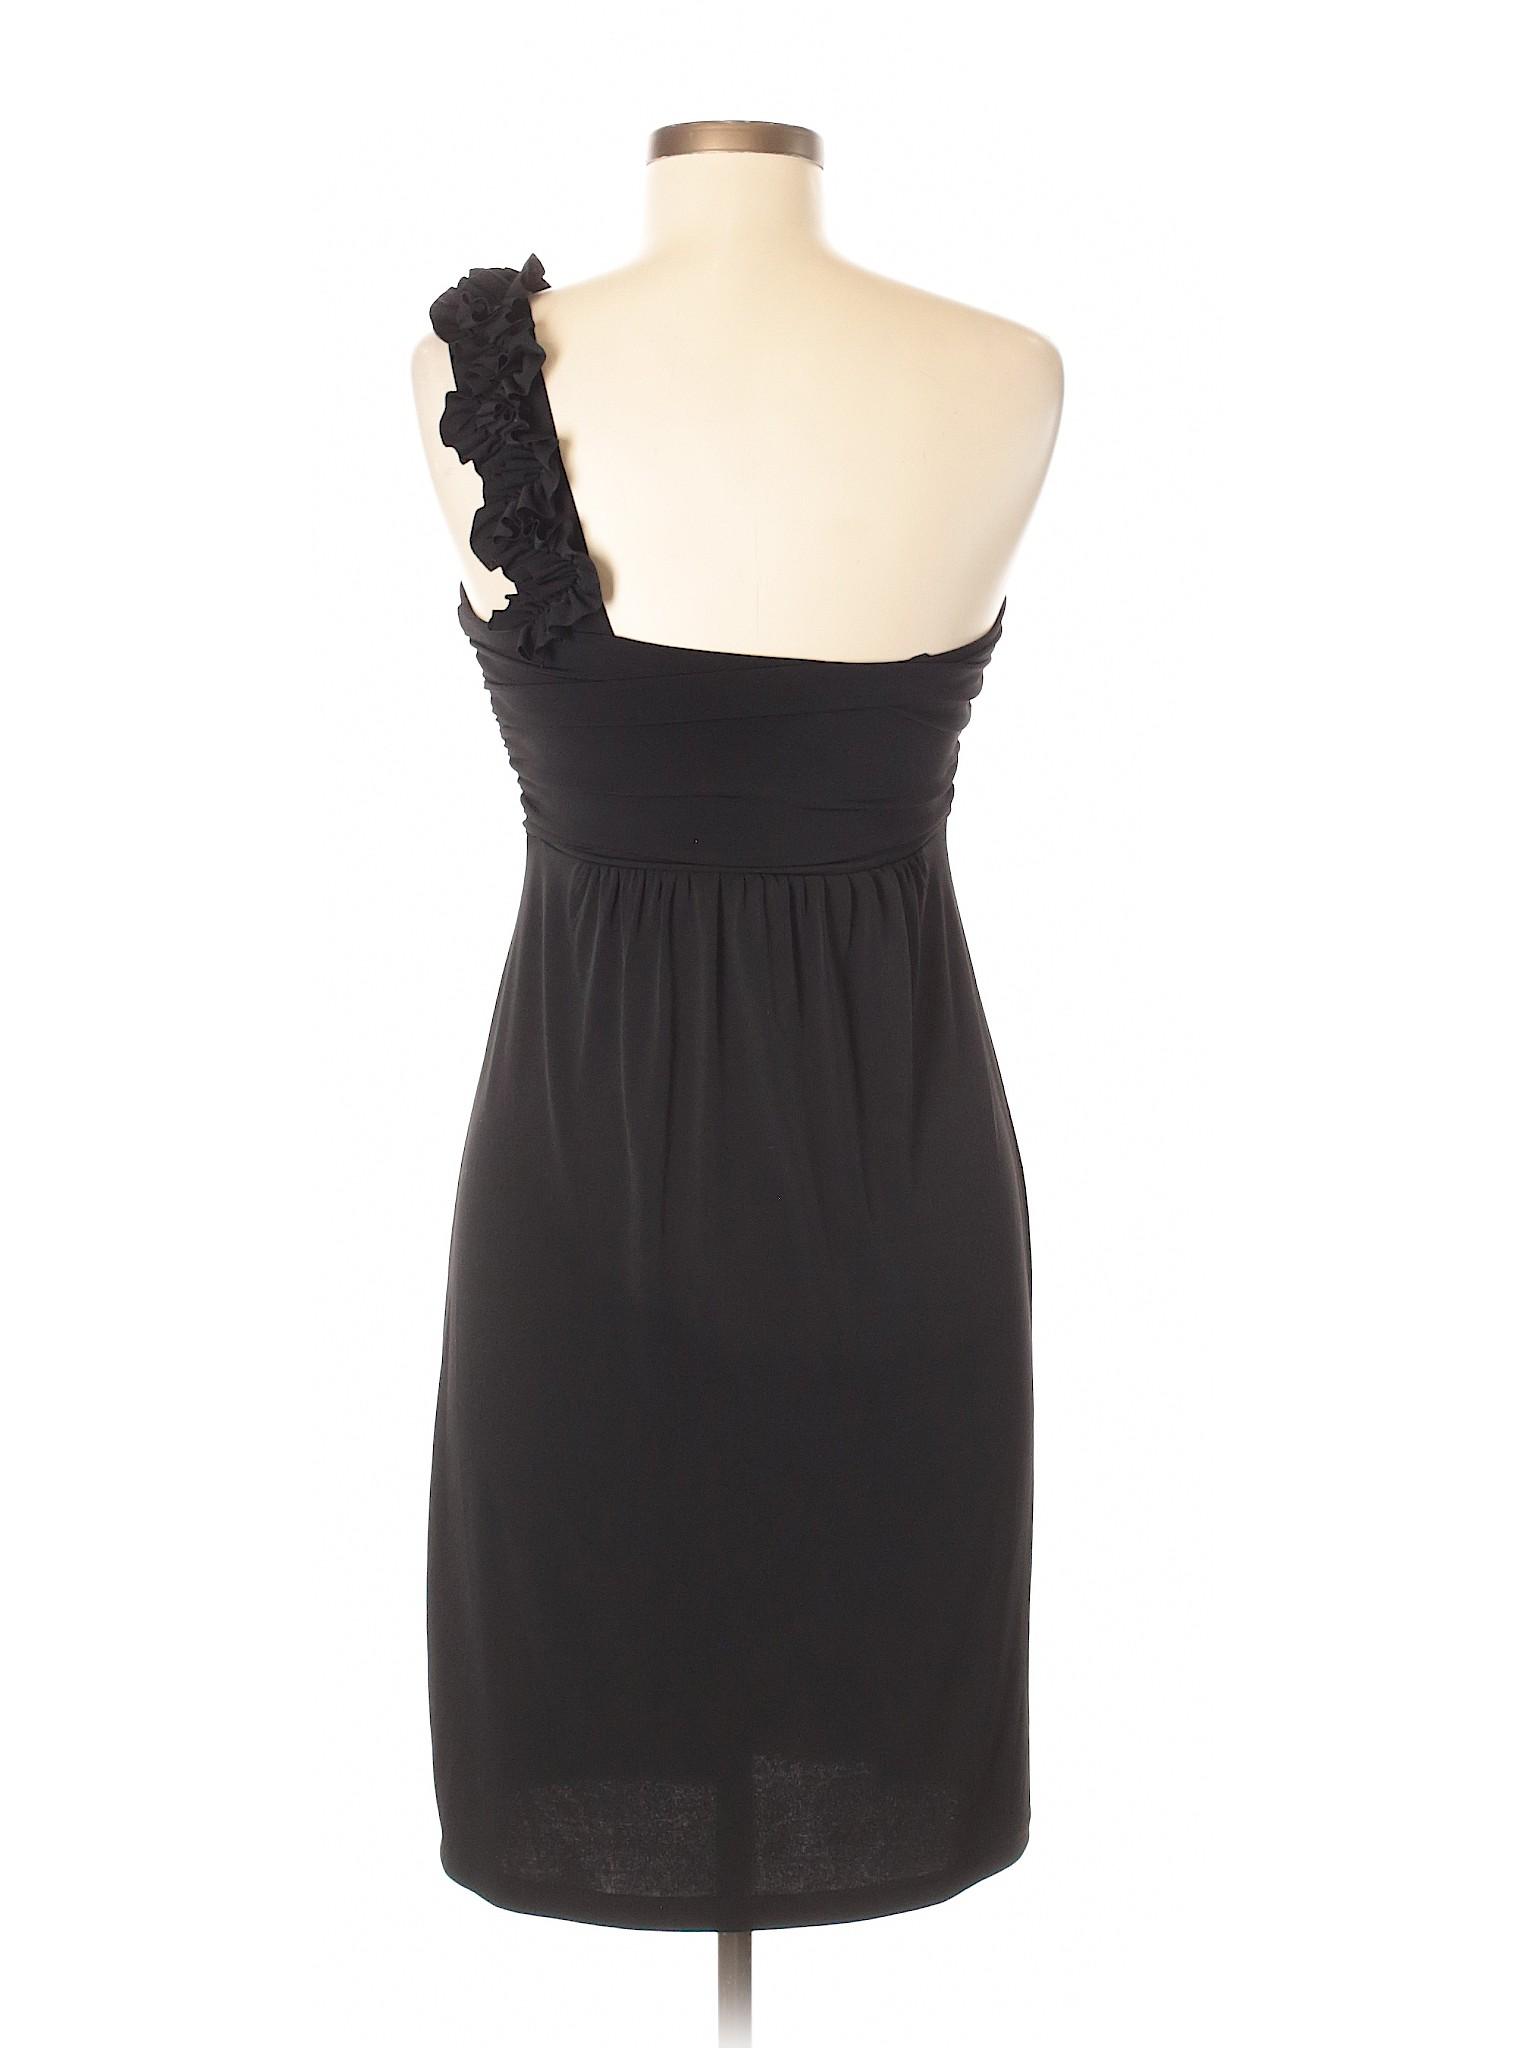 winter Dress Bertinelli Valerie Cocktail Boutique xU6Y0pYw